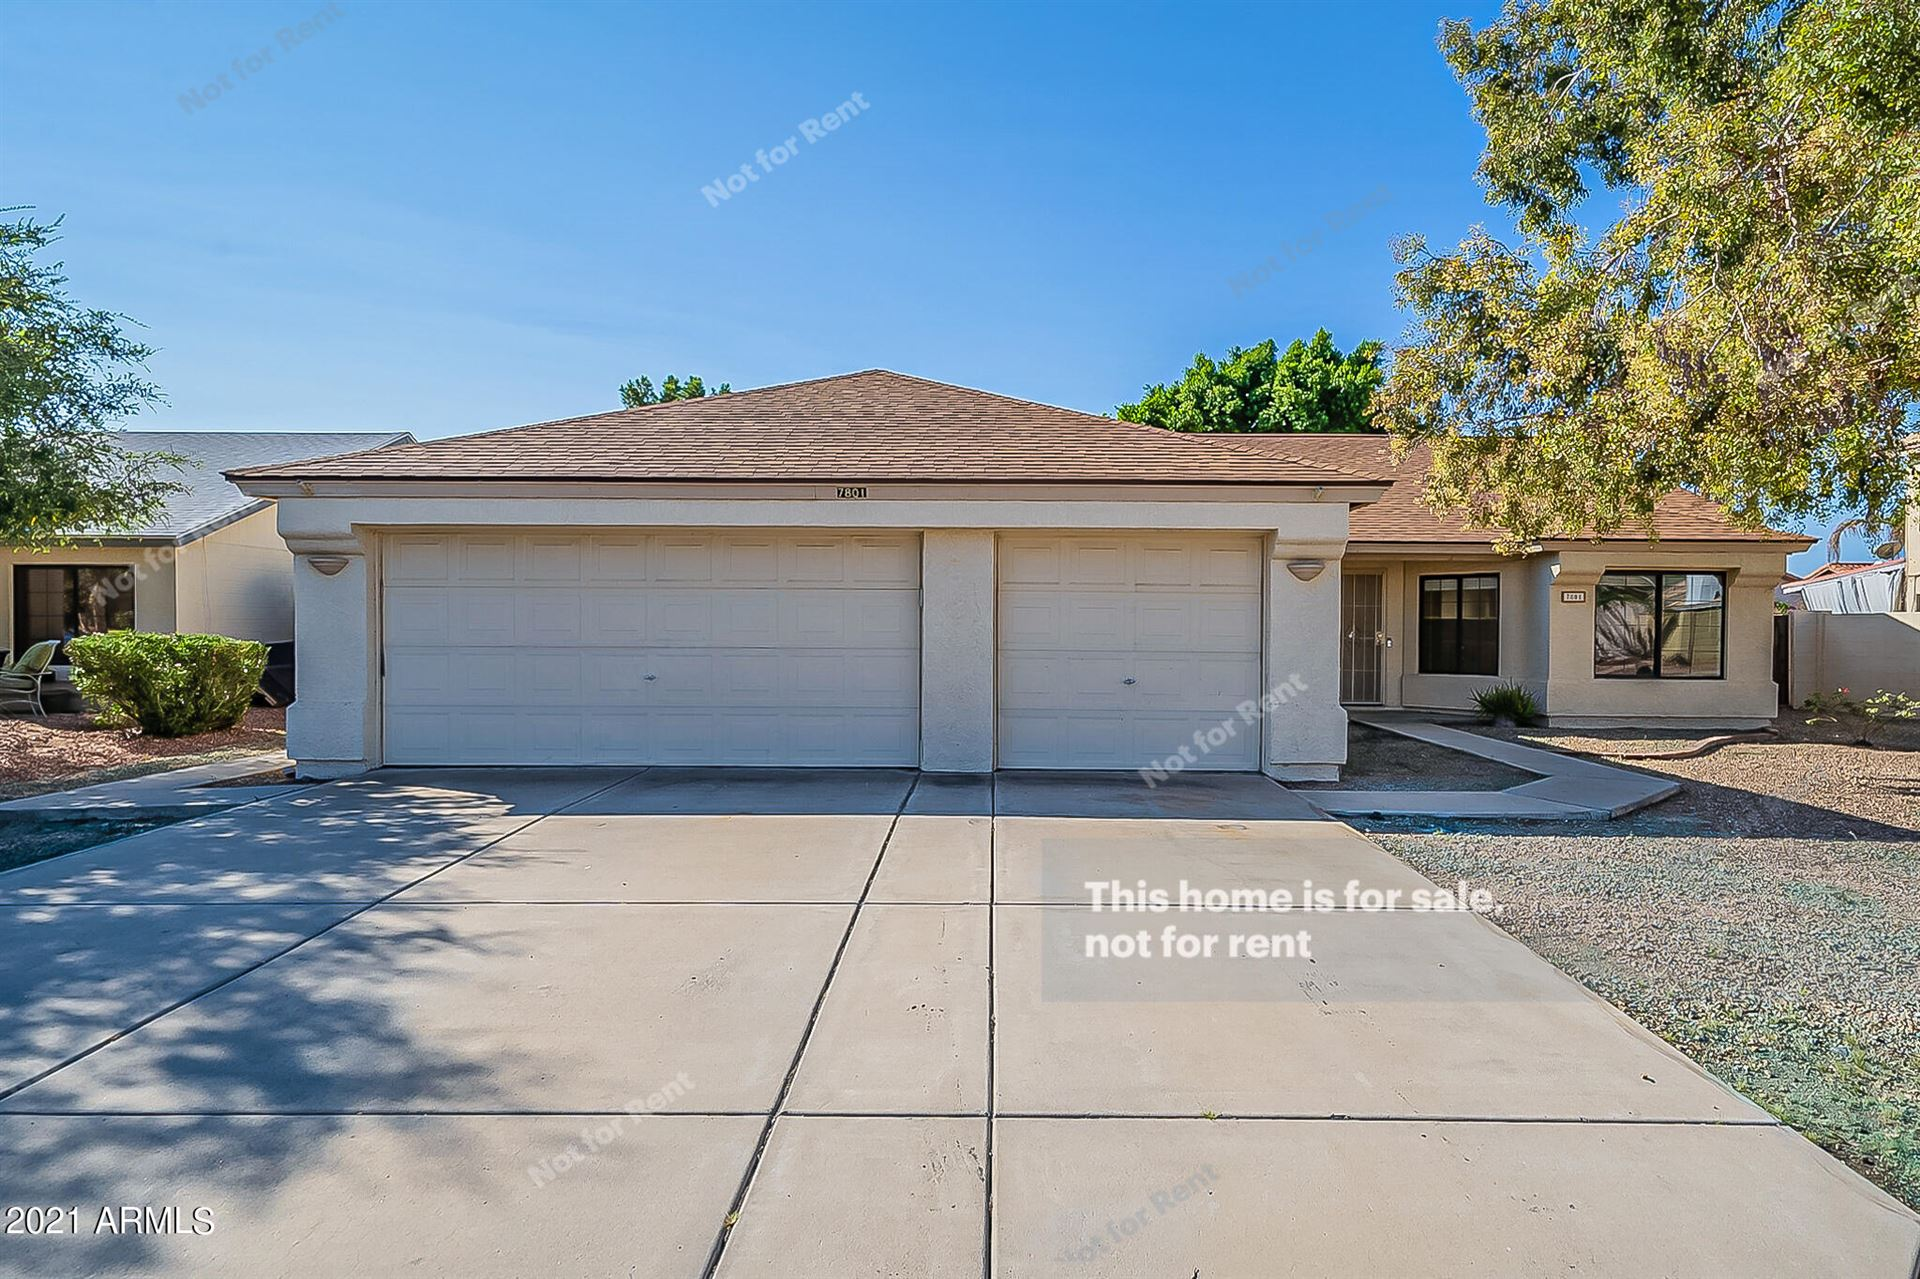 Photo of 7801 W CALAVAR Road, Peoria, AZ 85381 (MLS # 6296512)